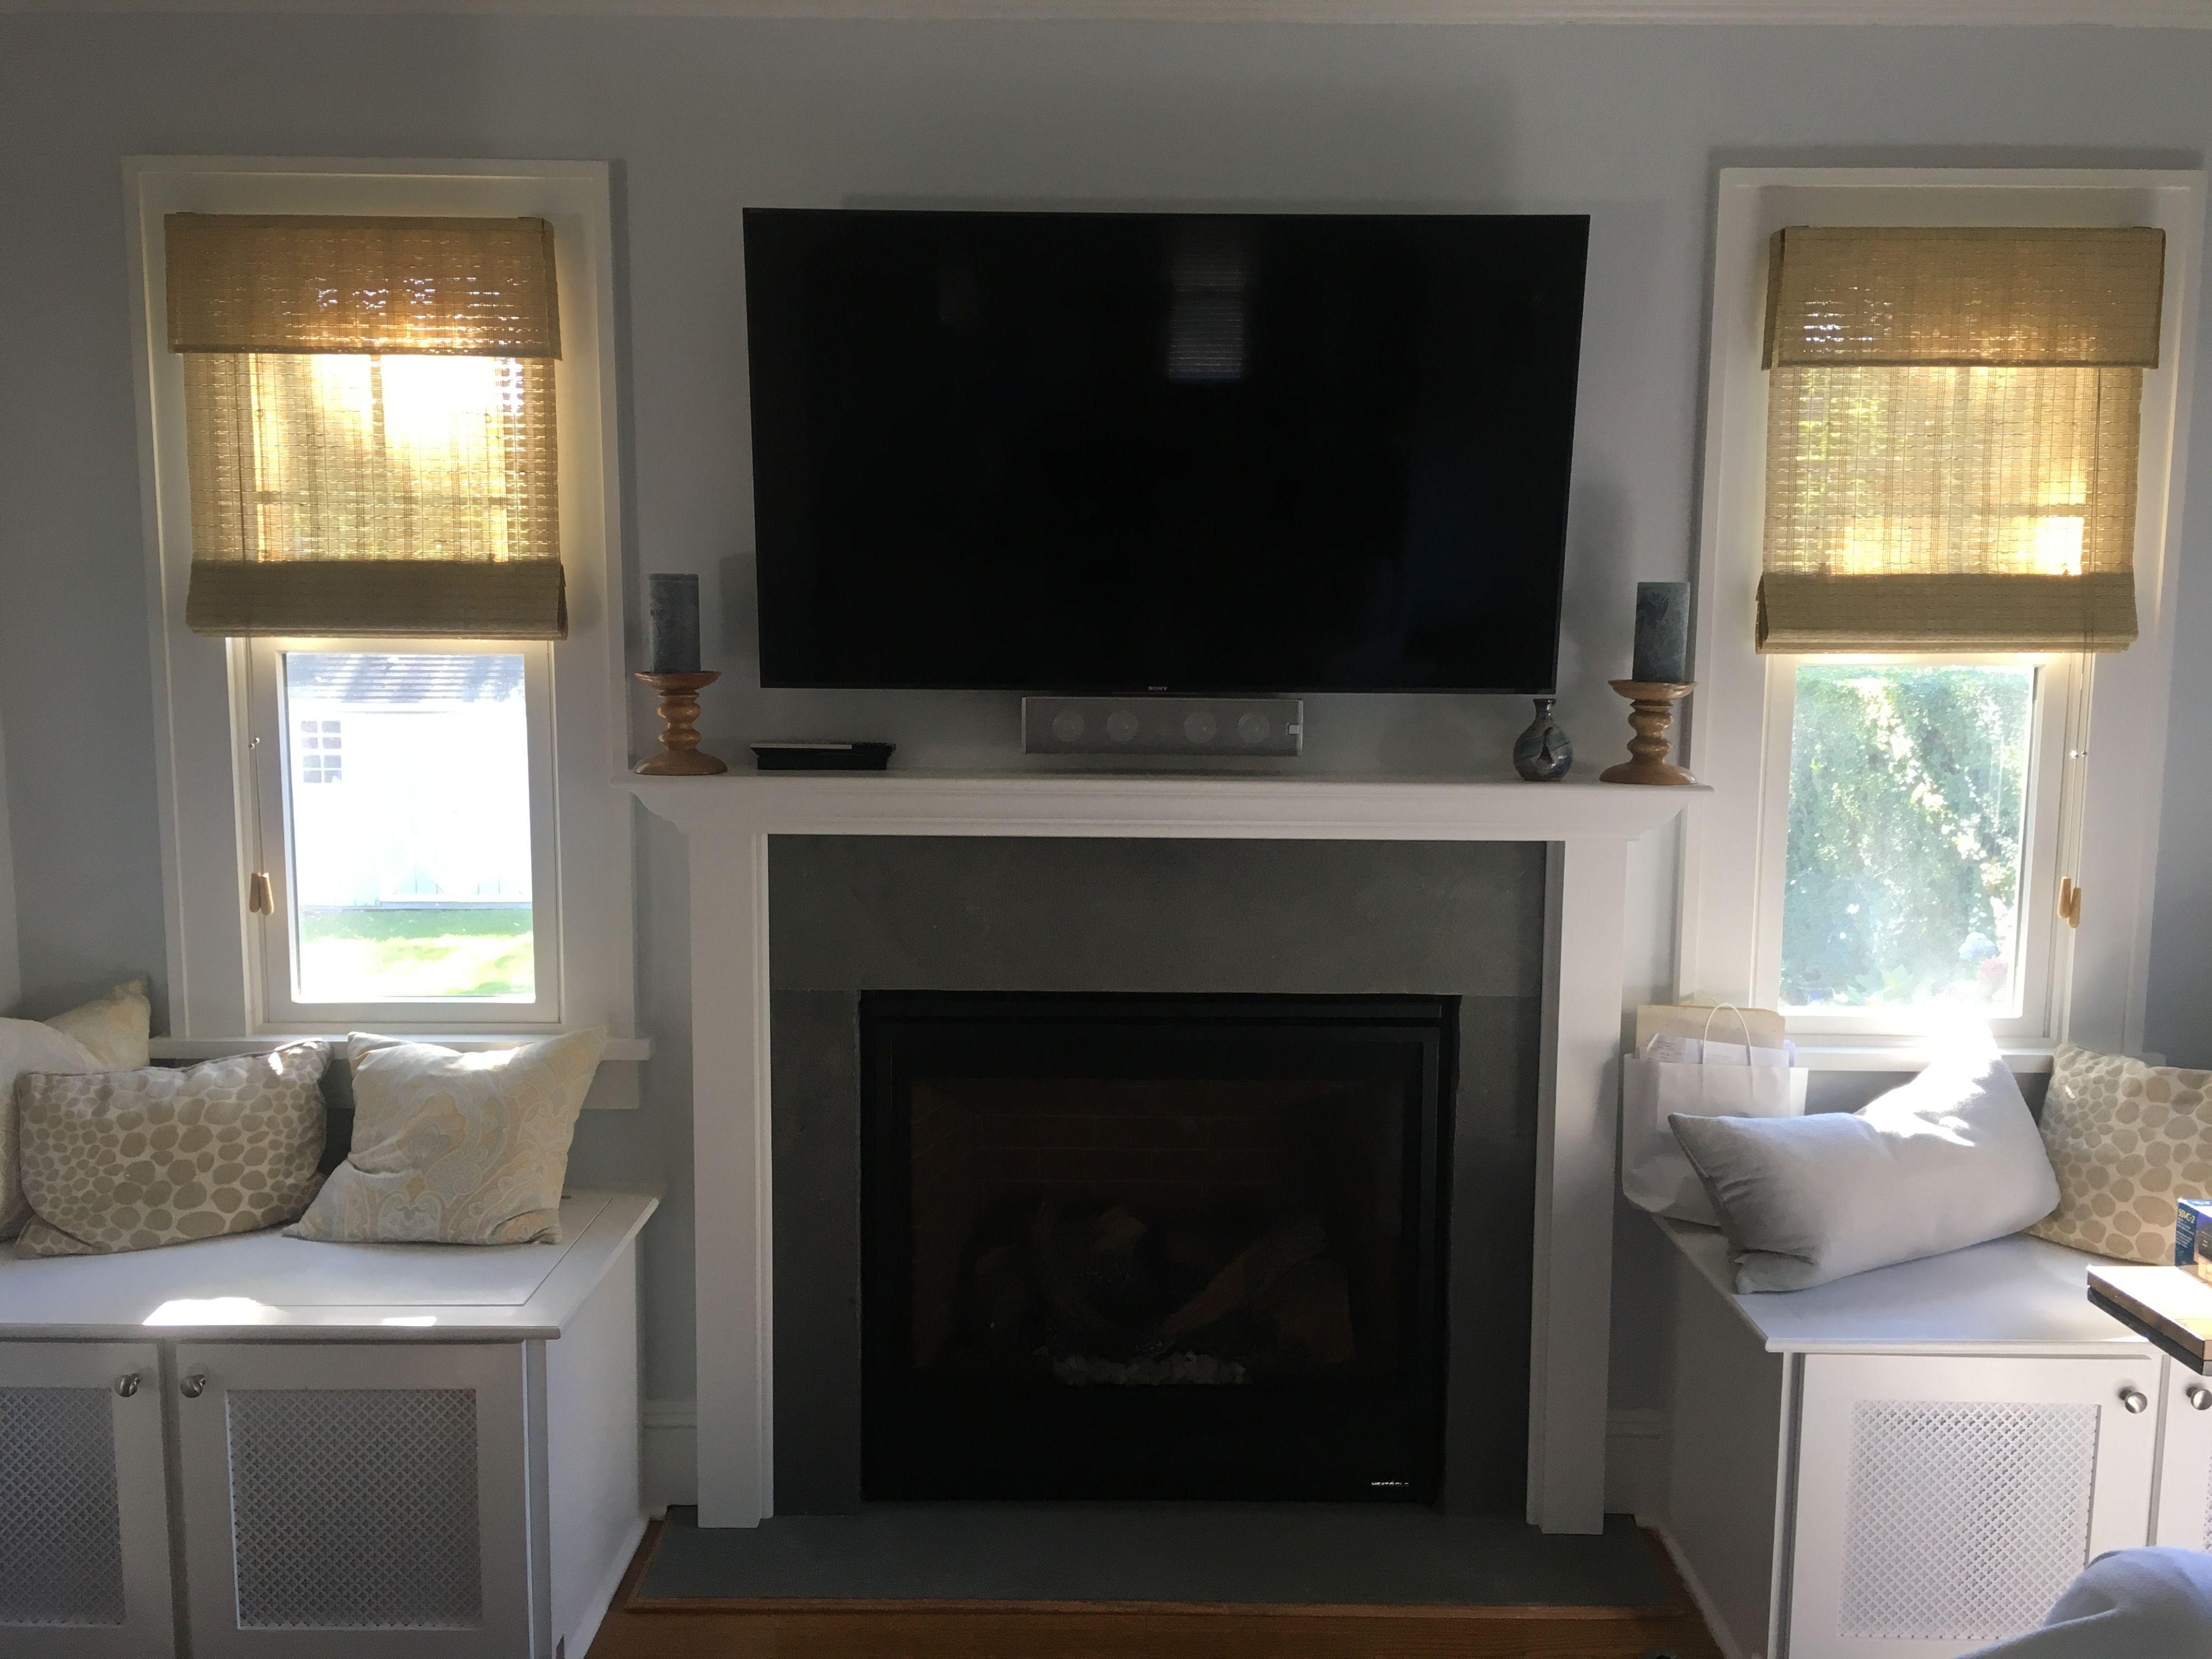 Slimline 7x Fireplace Gas Fireplace Home Decor